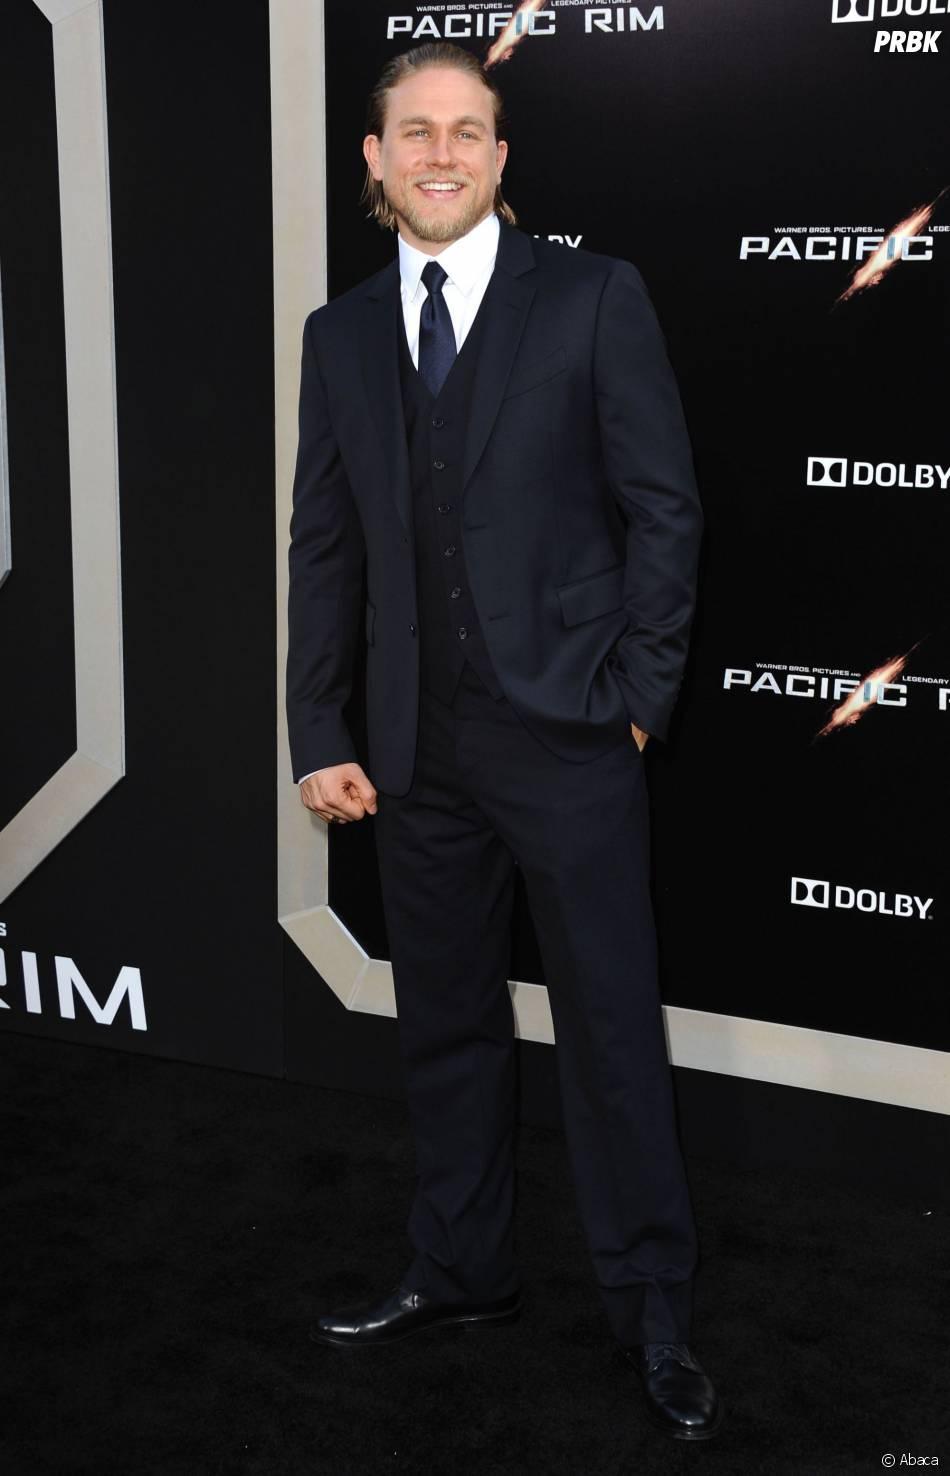 Charlie Hunnam rejointFifty Shades of Grey